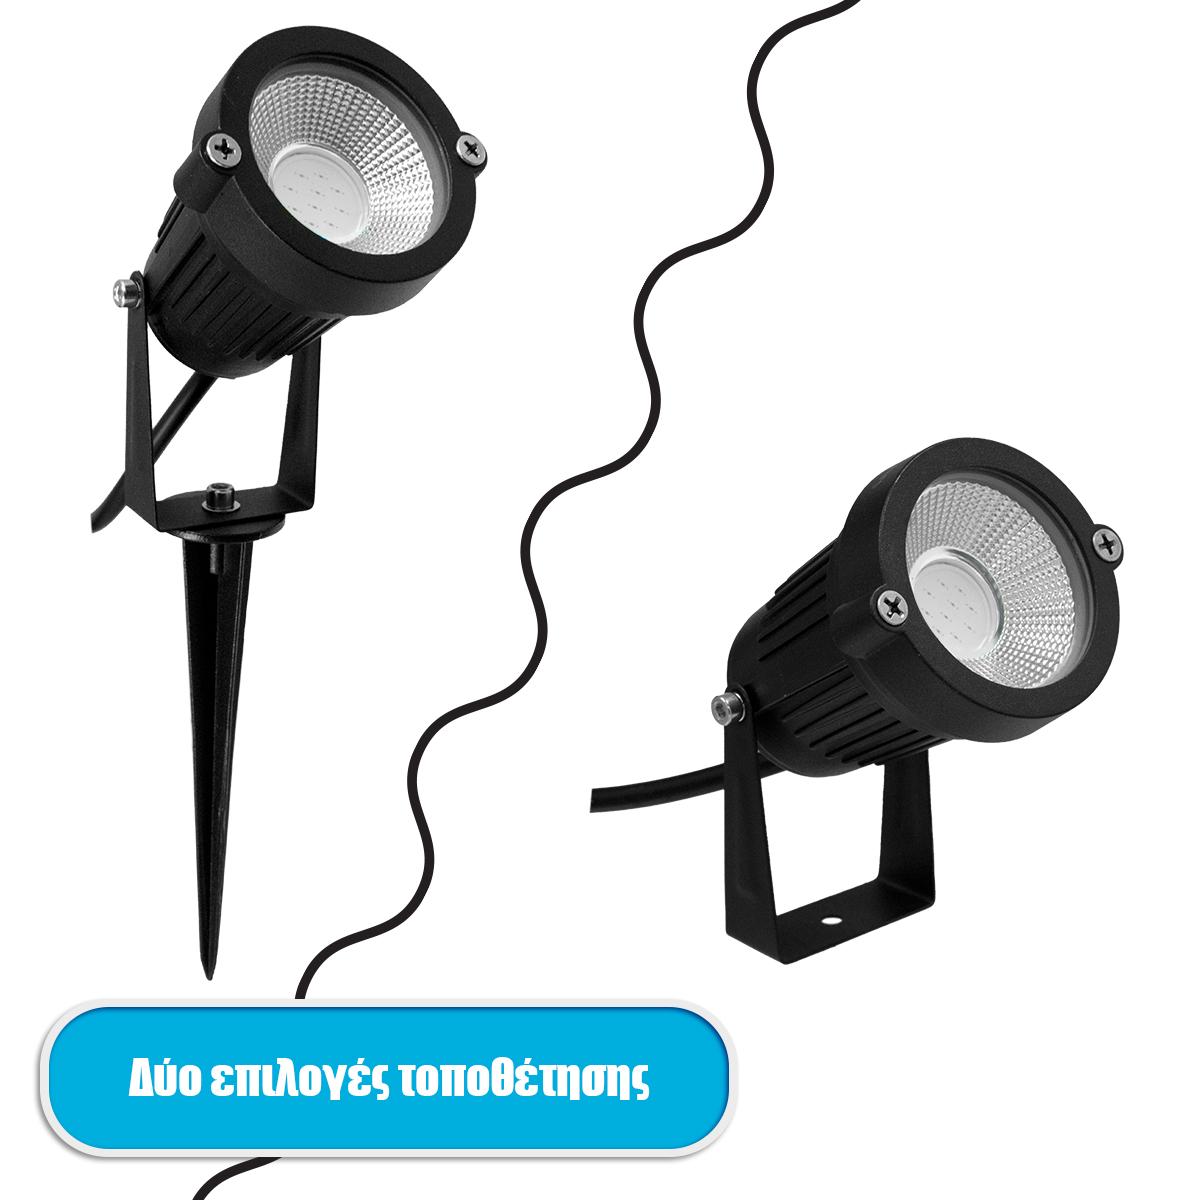 globostar-75585-provolaki-kipou-karfoto-dapedou-bridgelux-cob-led-10w-1000lm-35-dc-12-24v-adiavroho-ip67-ultra-kokkino-dimmable